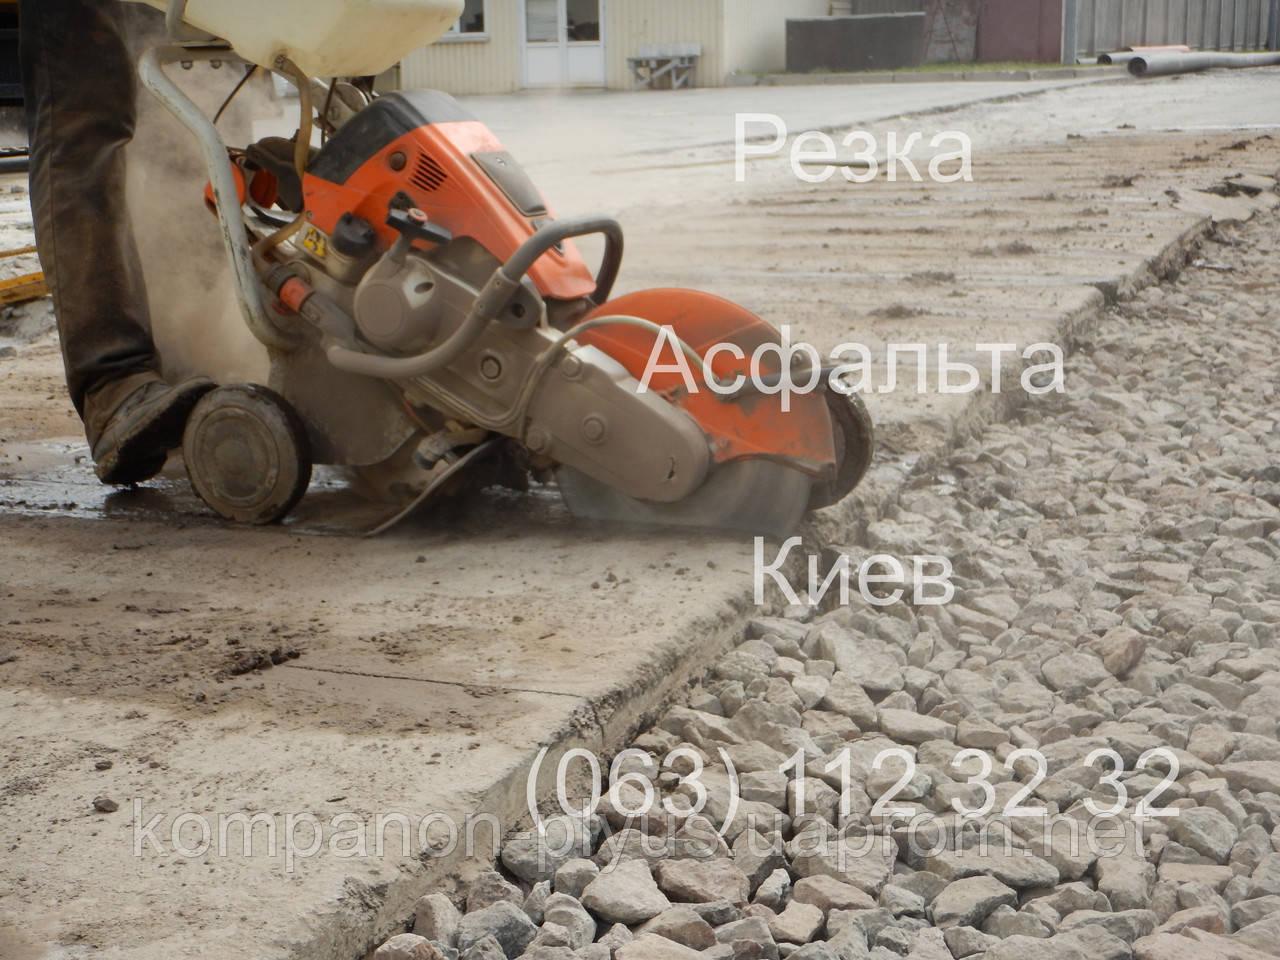 Різка асфальту (063) 112 32 32